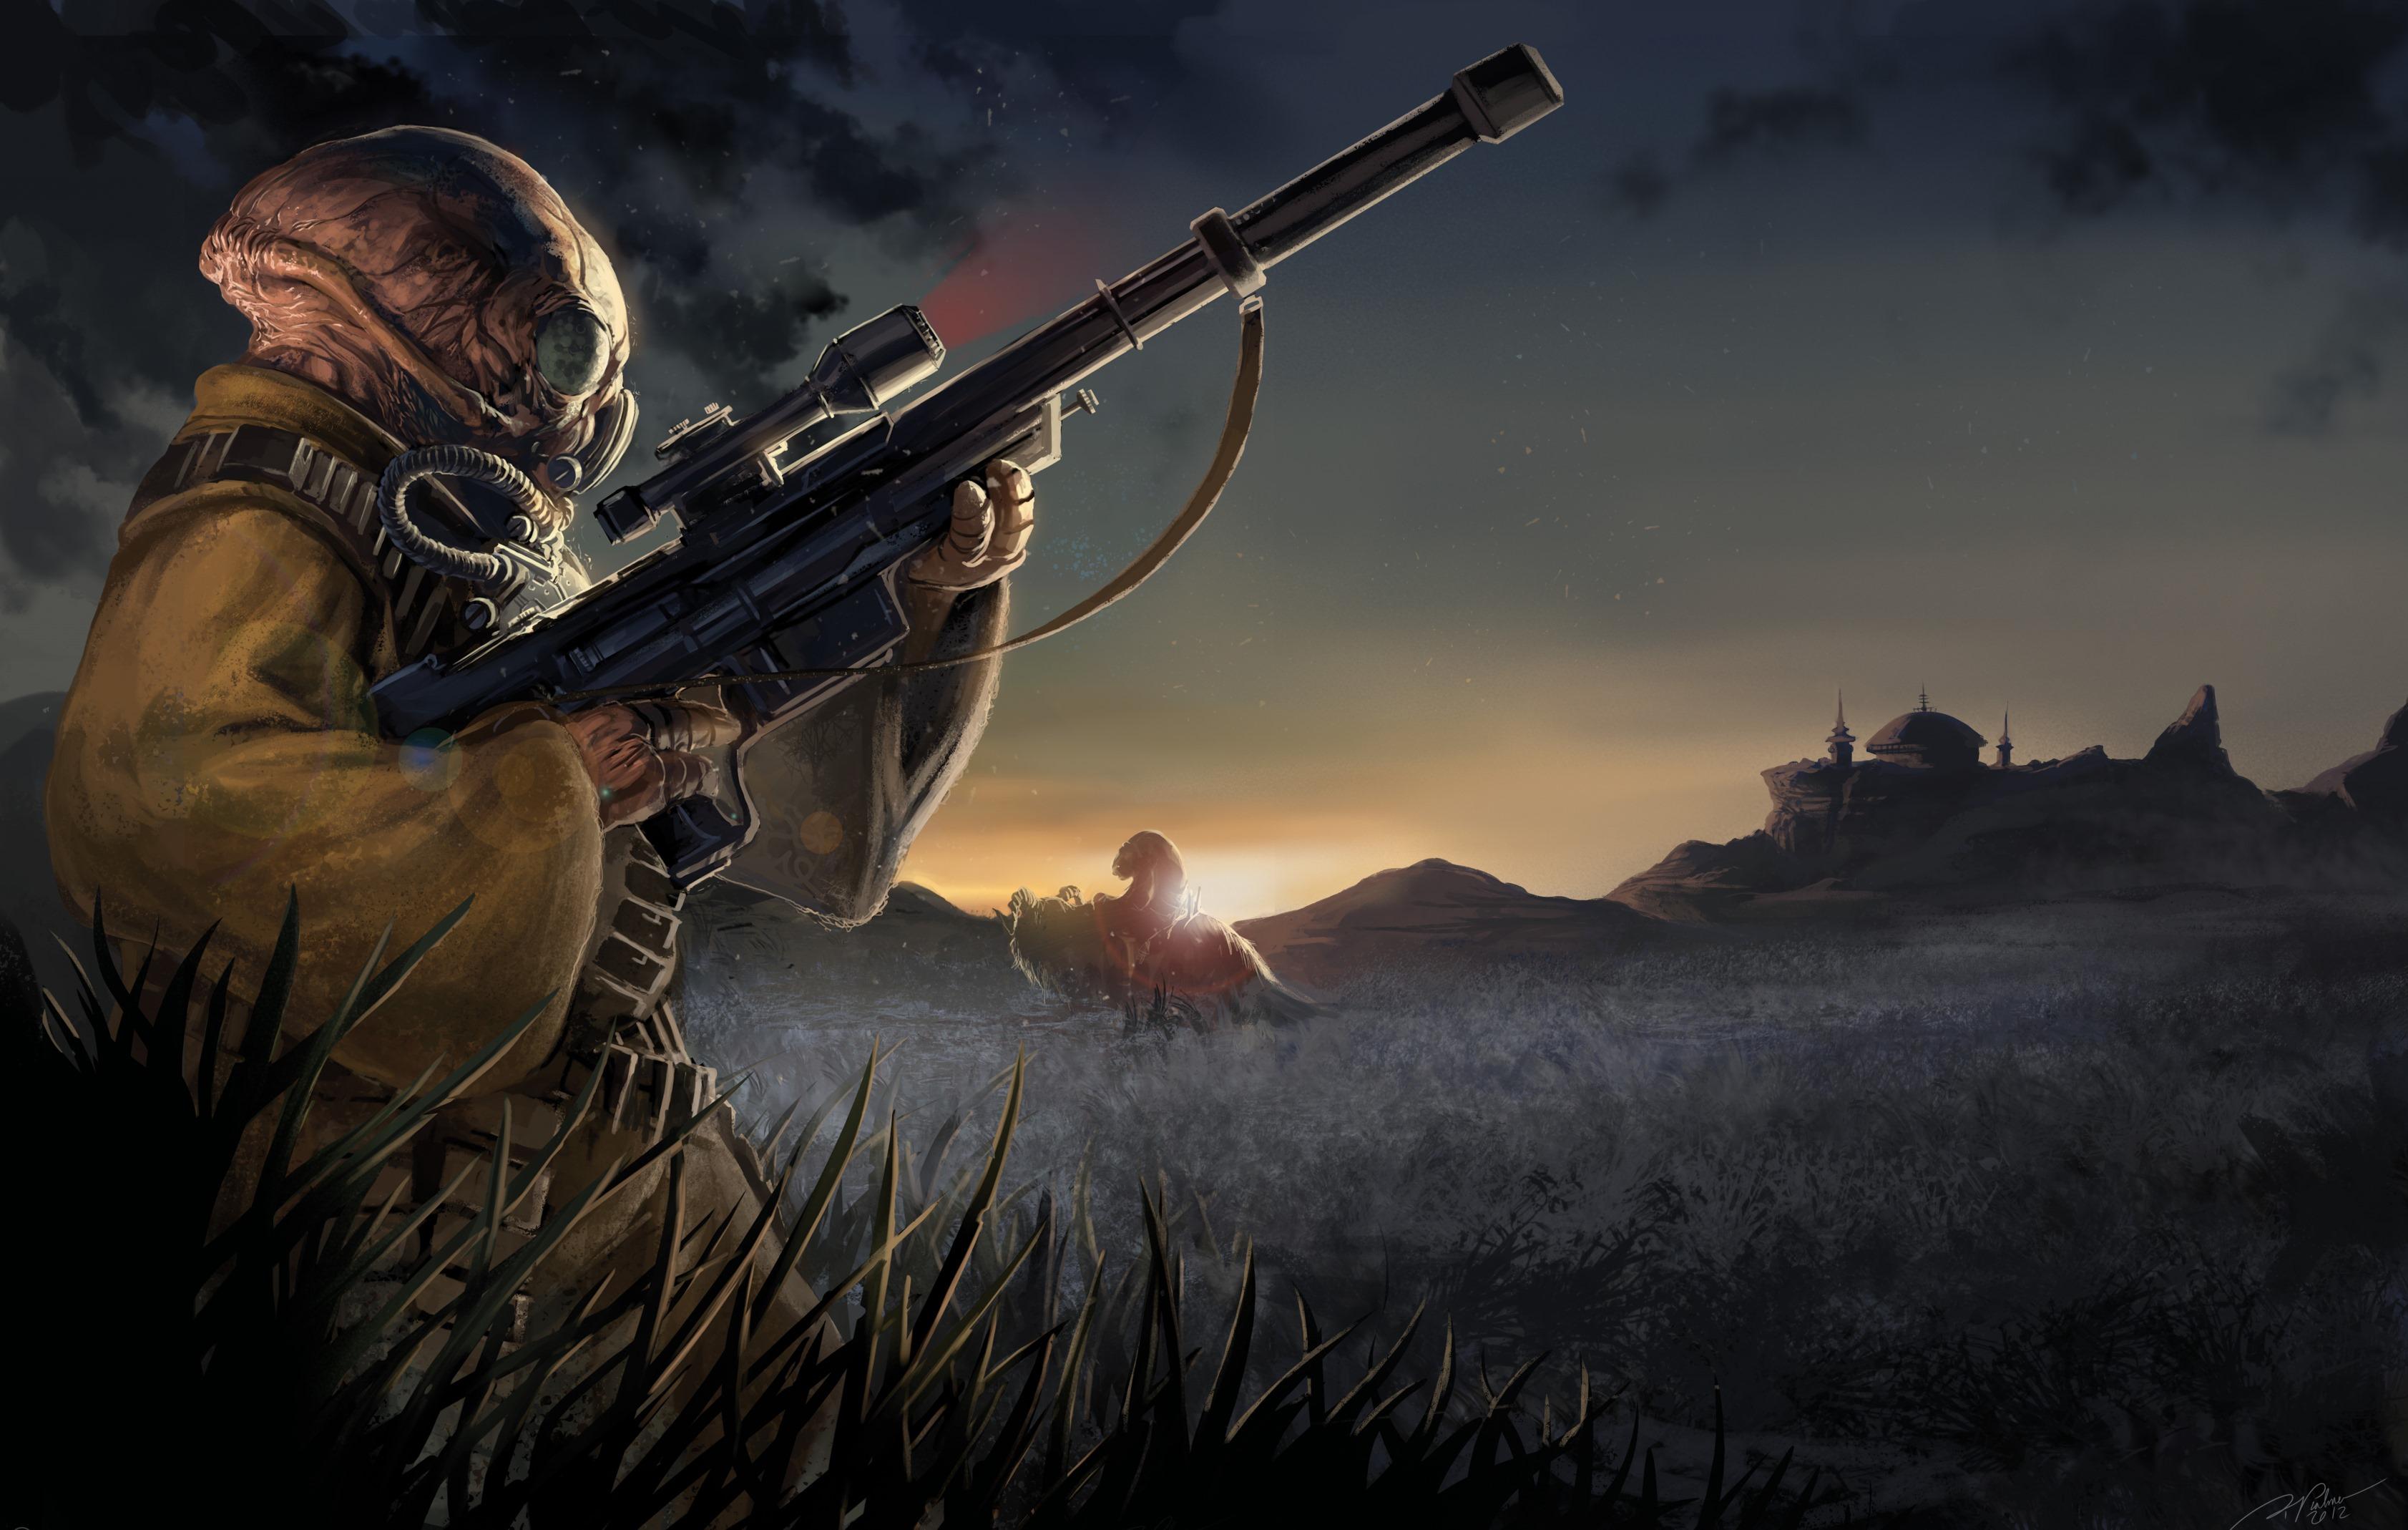 Eote gand bounty hunter by palmer